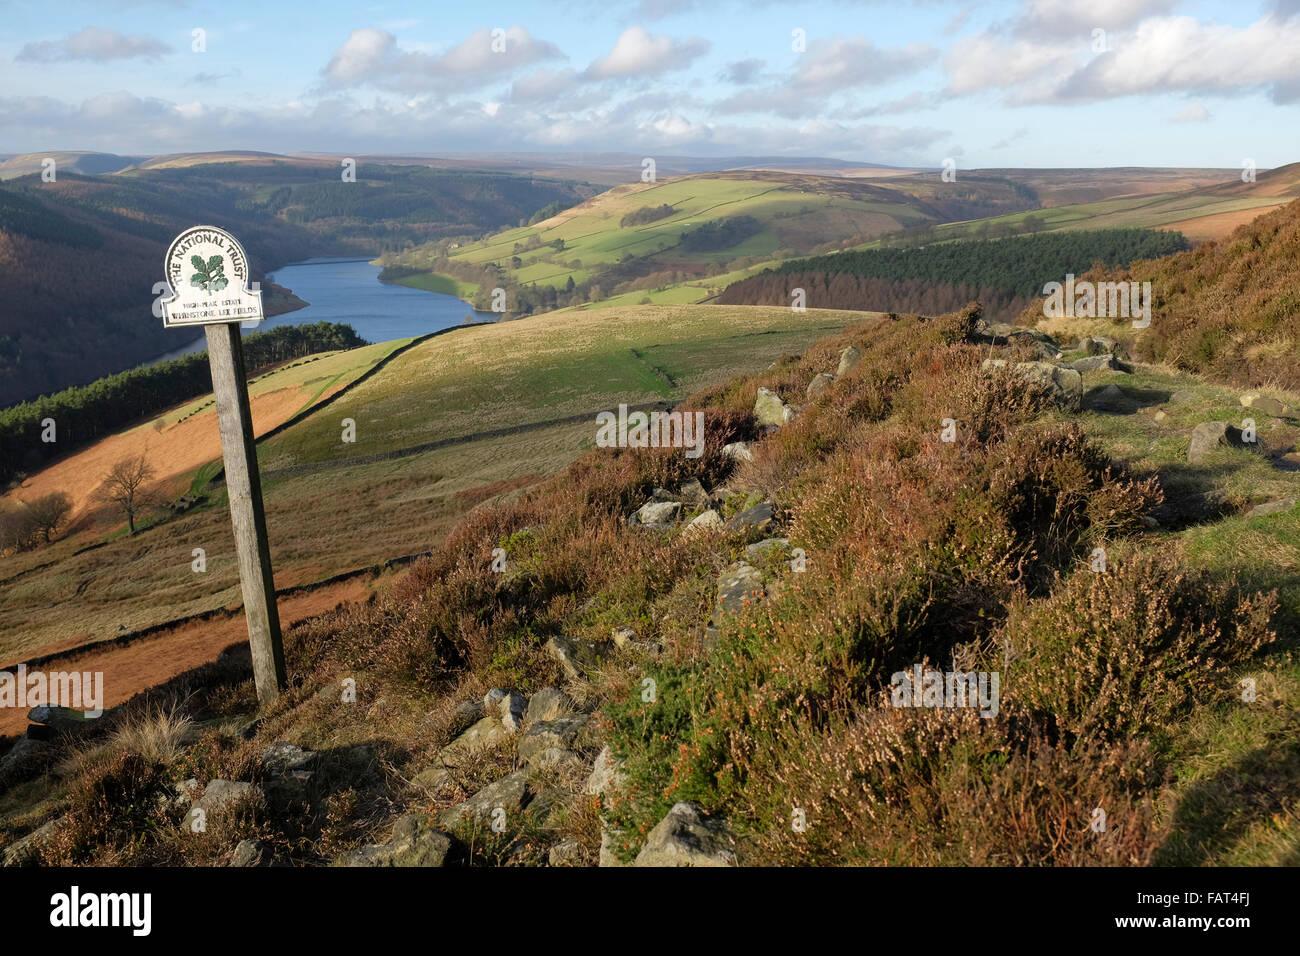 National Trust sign, High Peak Estate, Whinstone Lee Fields, Peak District National Park, Derbyshire, England, UK Stock Photo